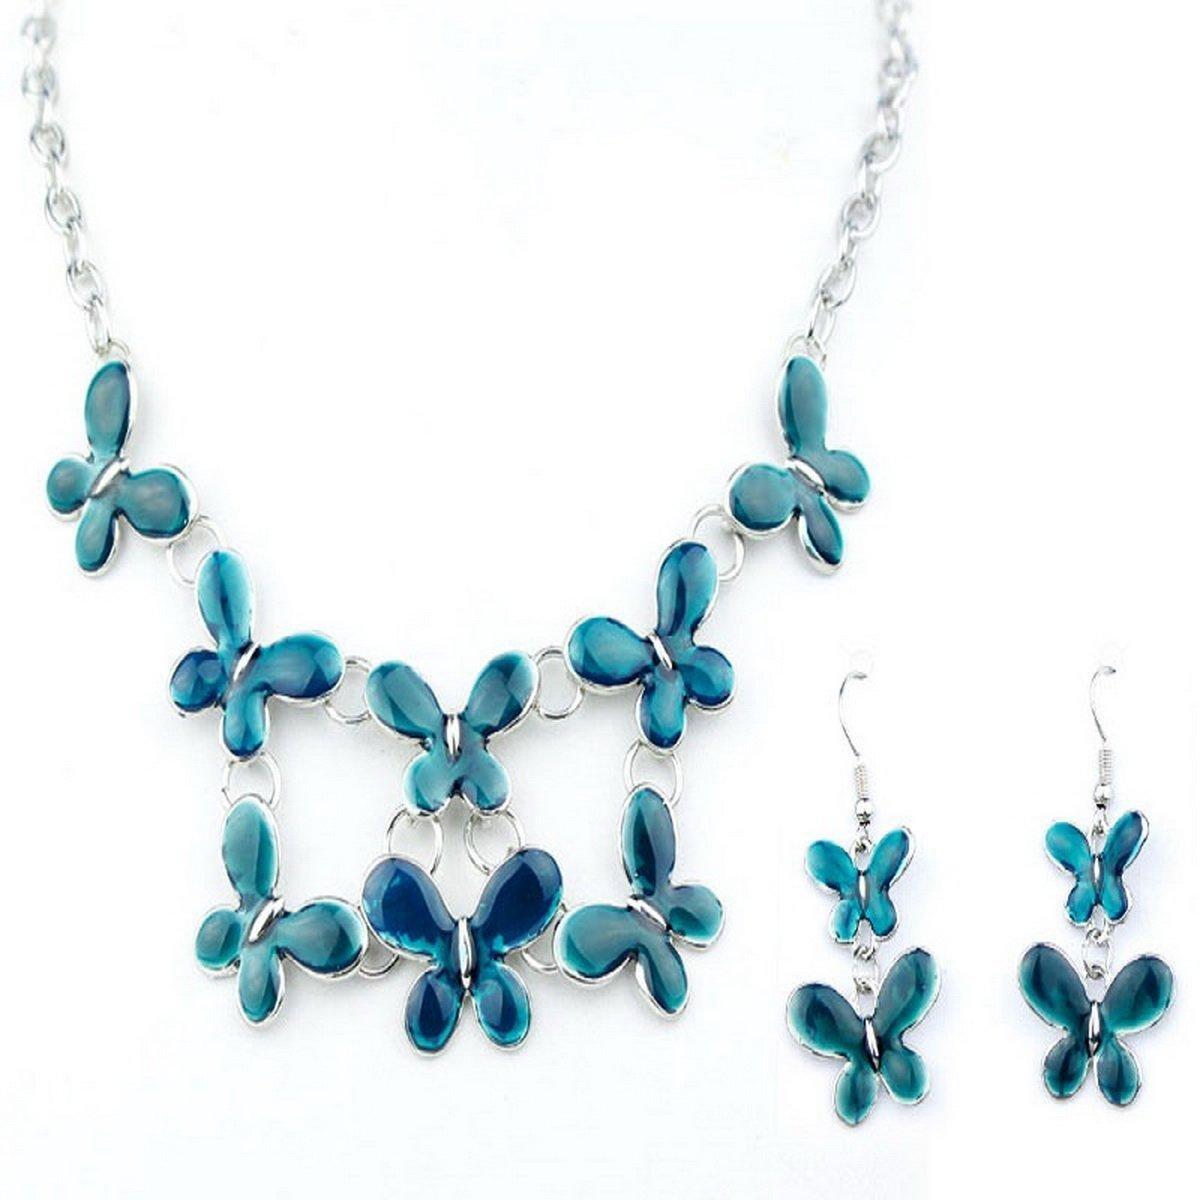 ARICO Multi Layer Necklace Earrings Butterfly Jewelry Sets Enamel Jewelry Set Silver Plated NE141